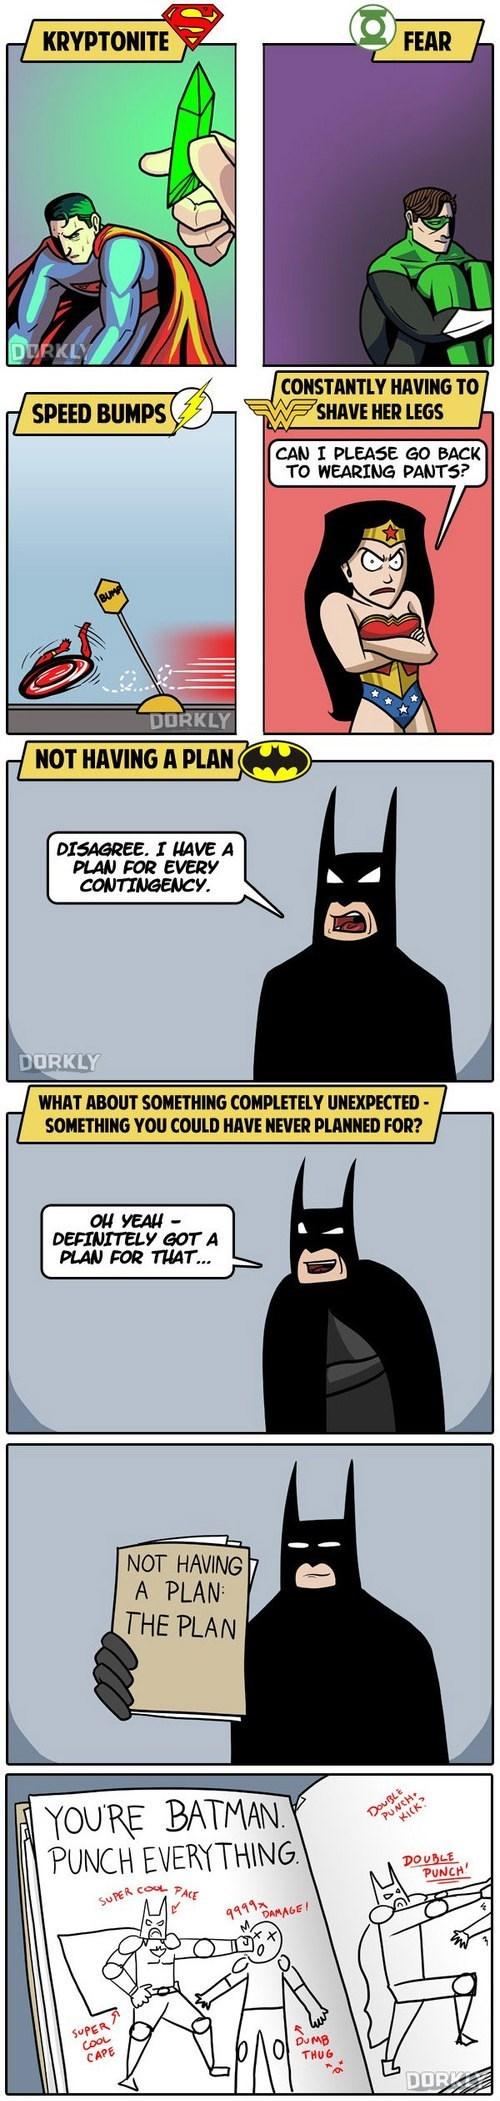 batman dorkly justice league weakness - 8241419008